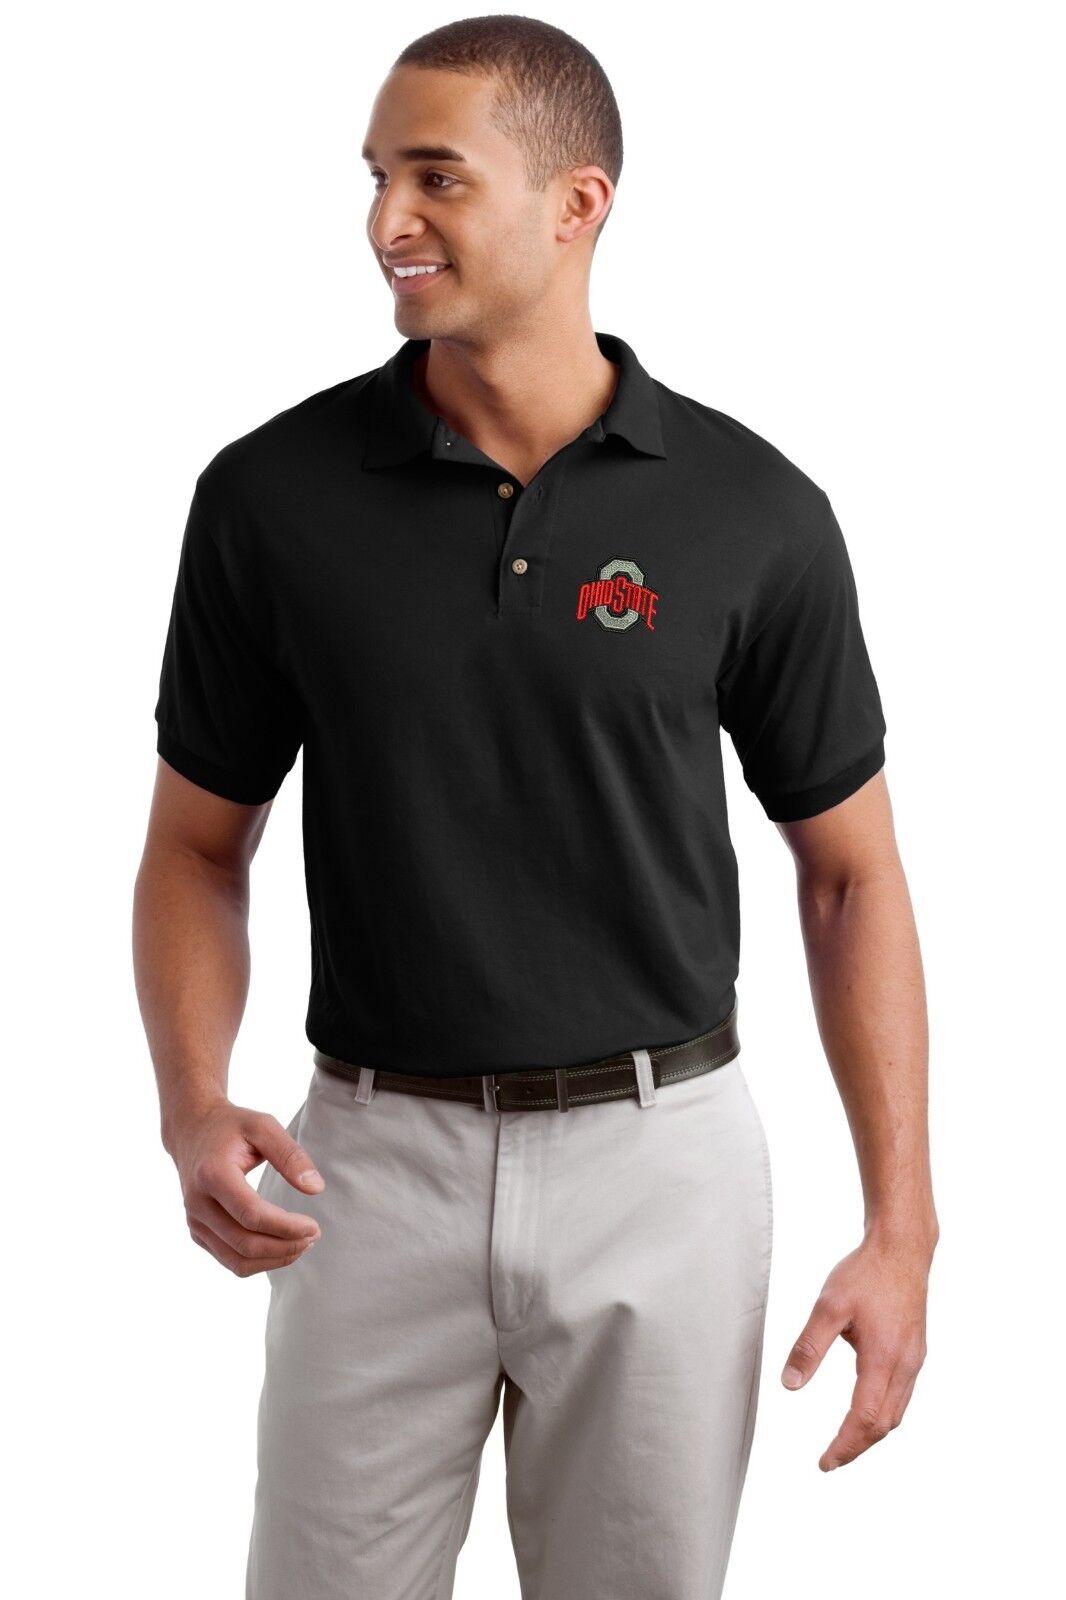 Ohio State Buckeyes Polo Golf Shirt - Embroidered